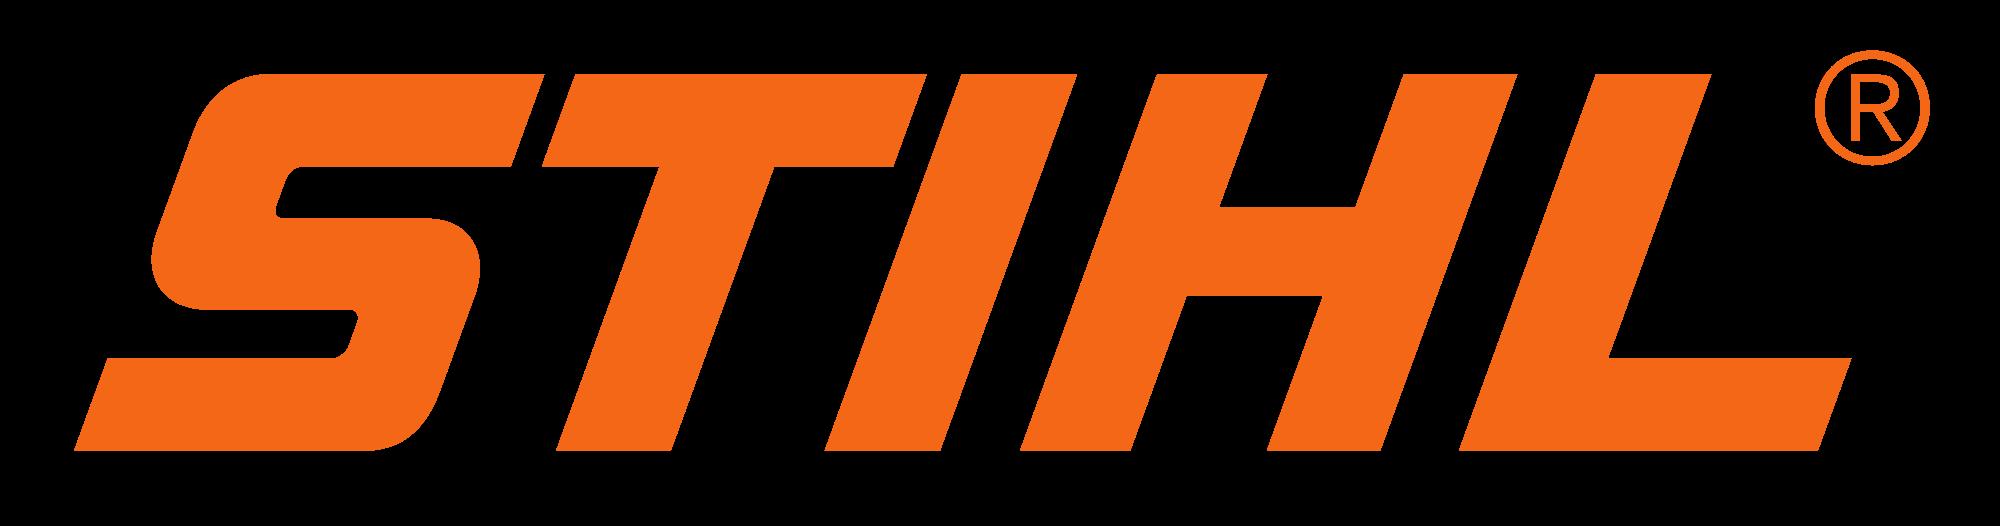 Stihl_Logo-svgLBoRCNse8SMQd